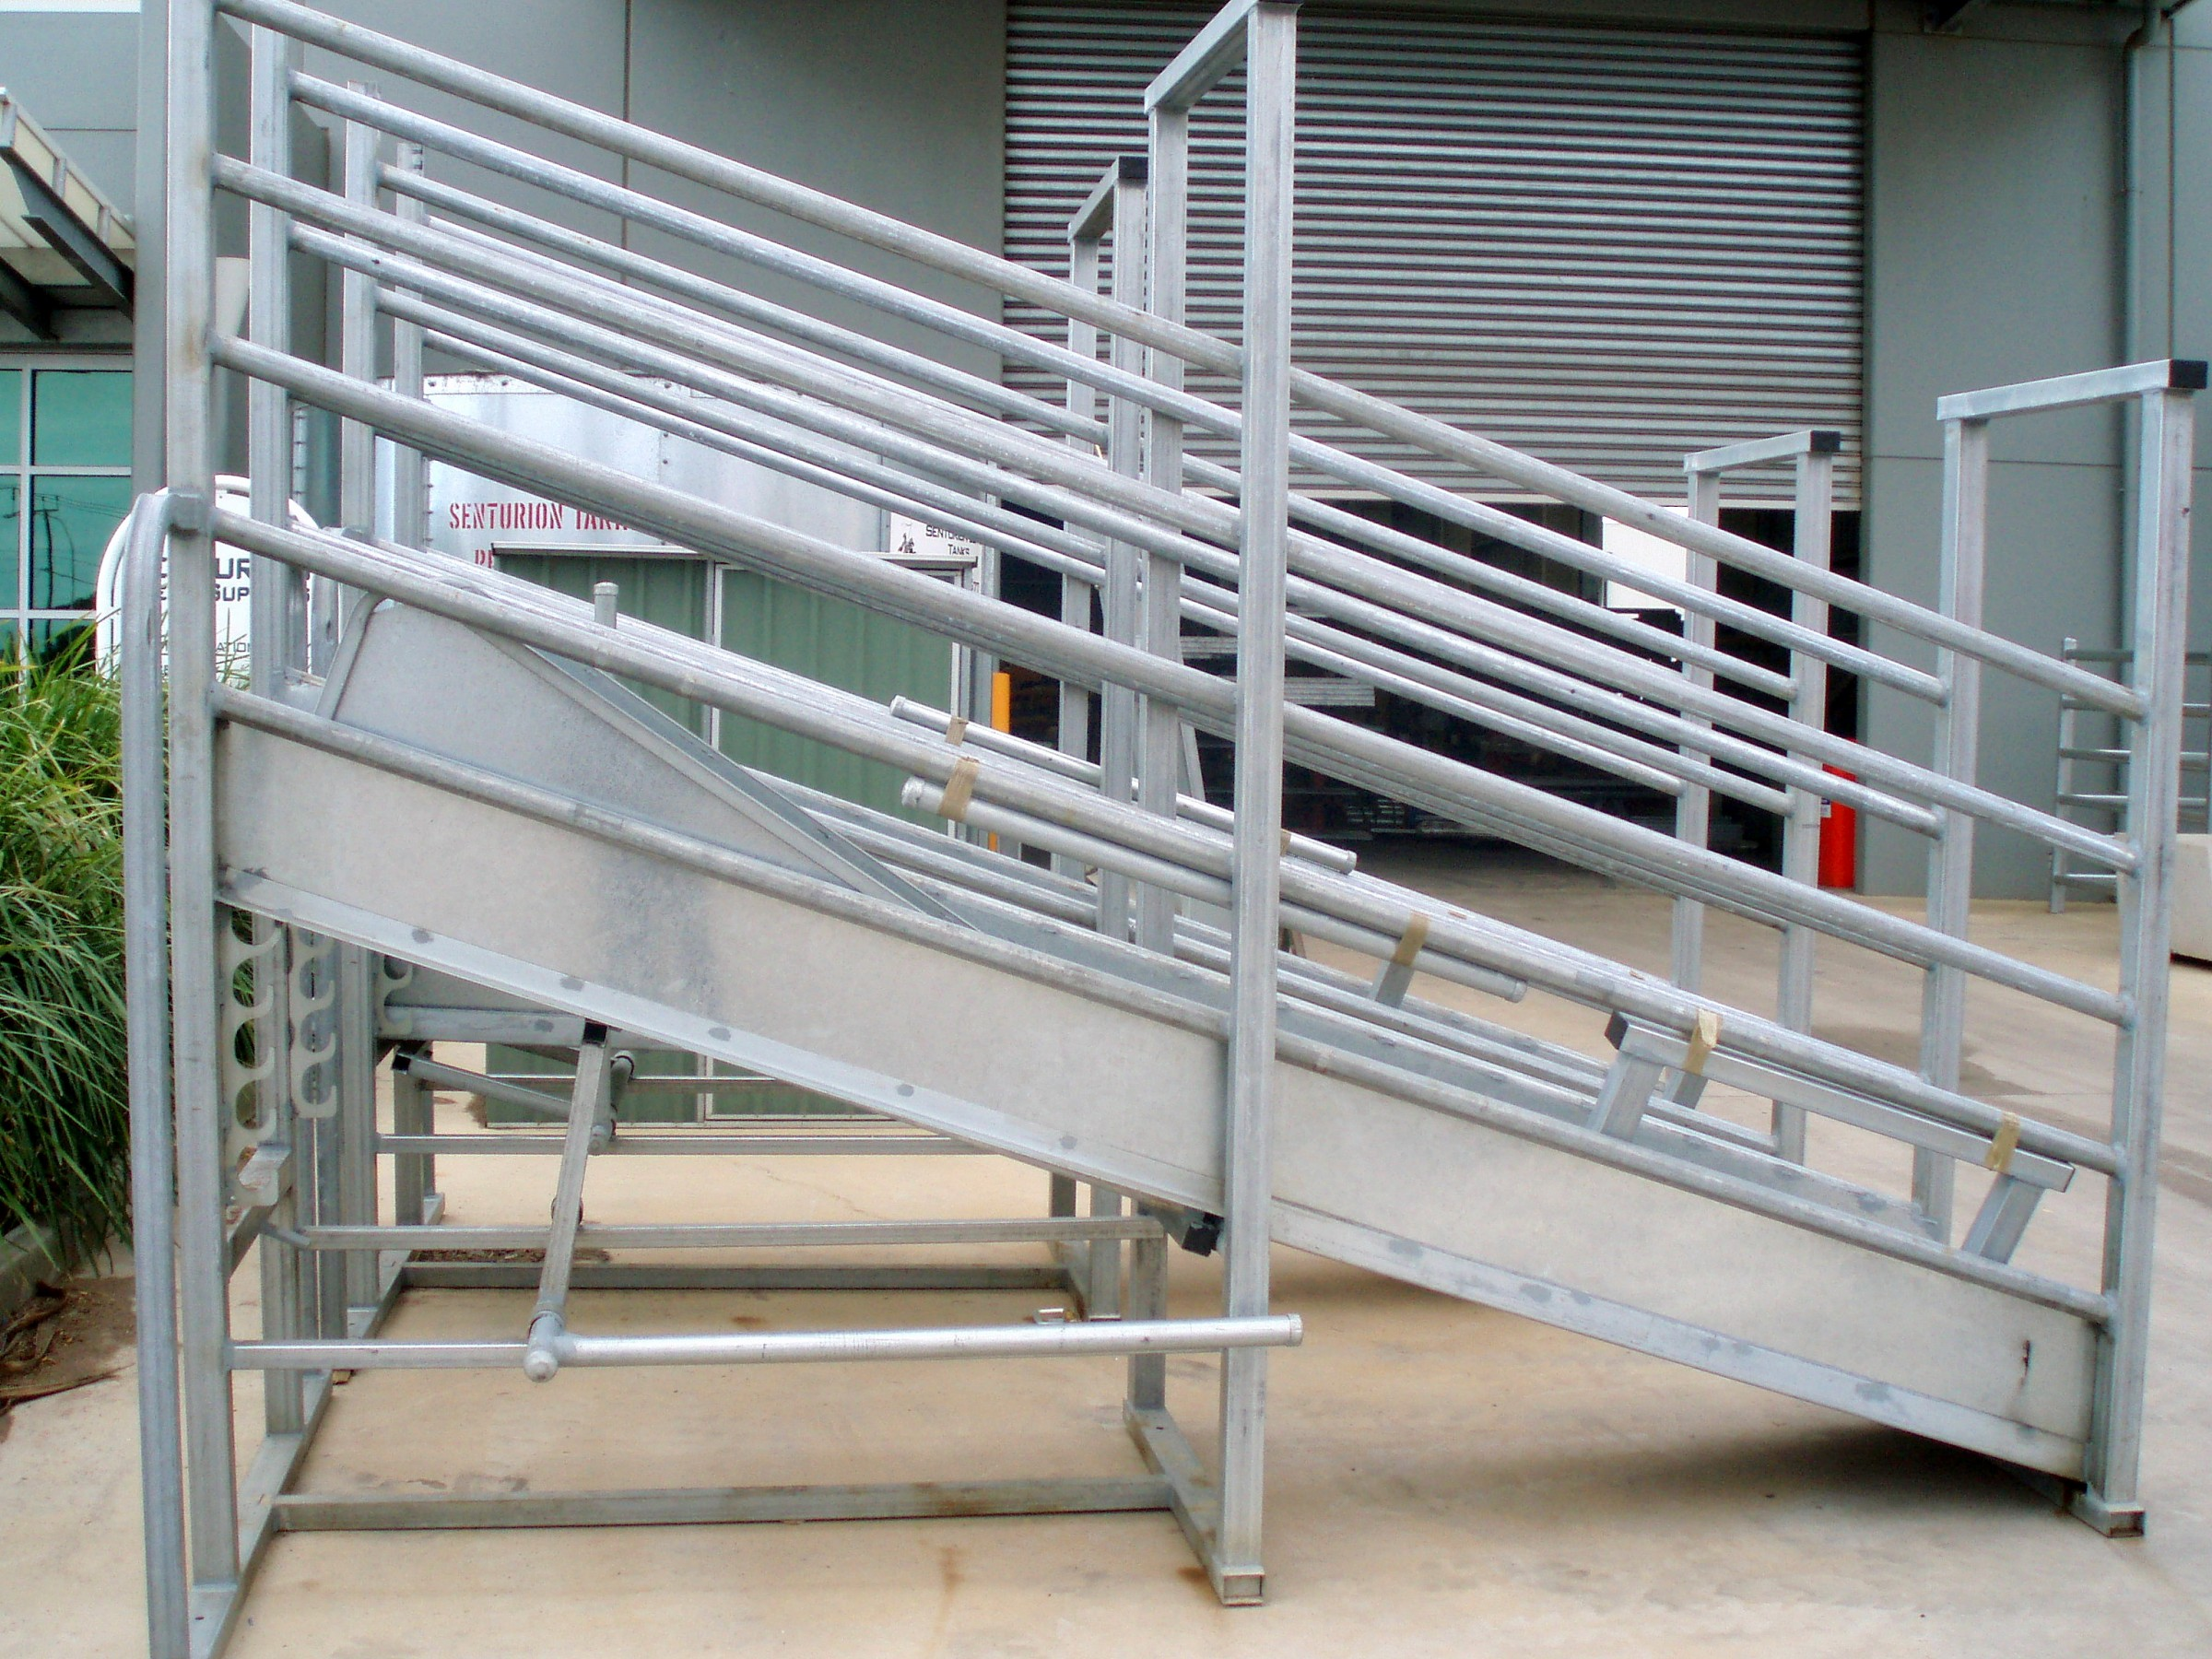 Senturion-Steel-Supplies-Adjustable-Cattle-Ramp-06